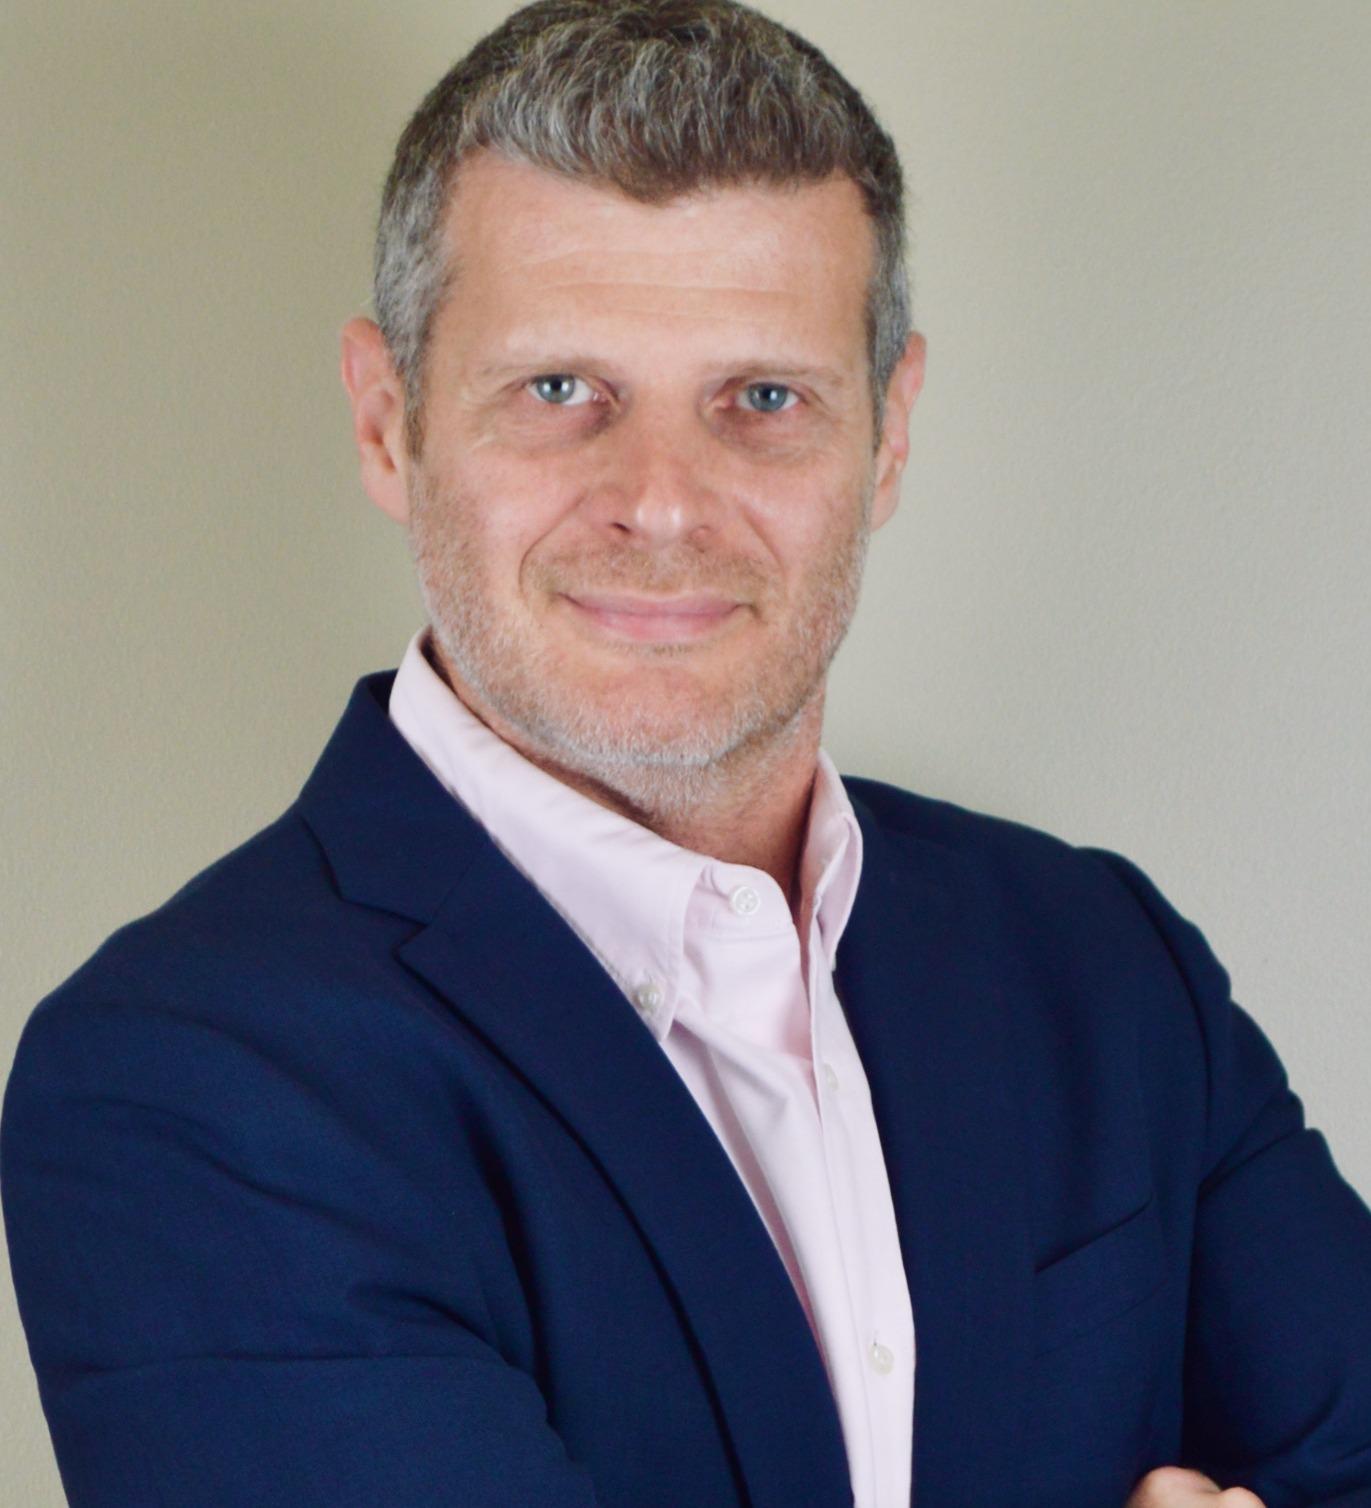 Stephen George Donaldson